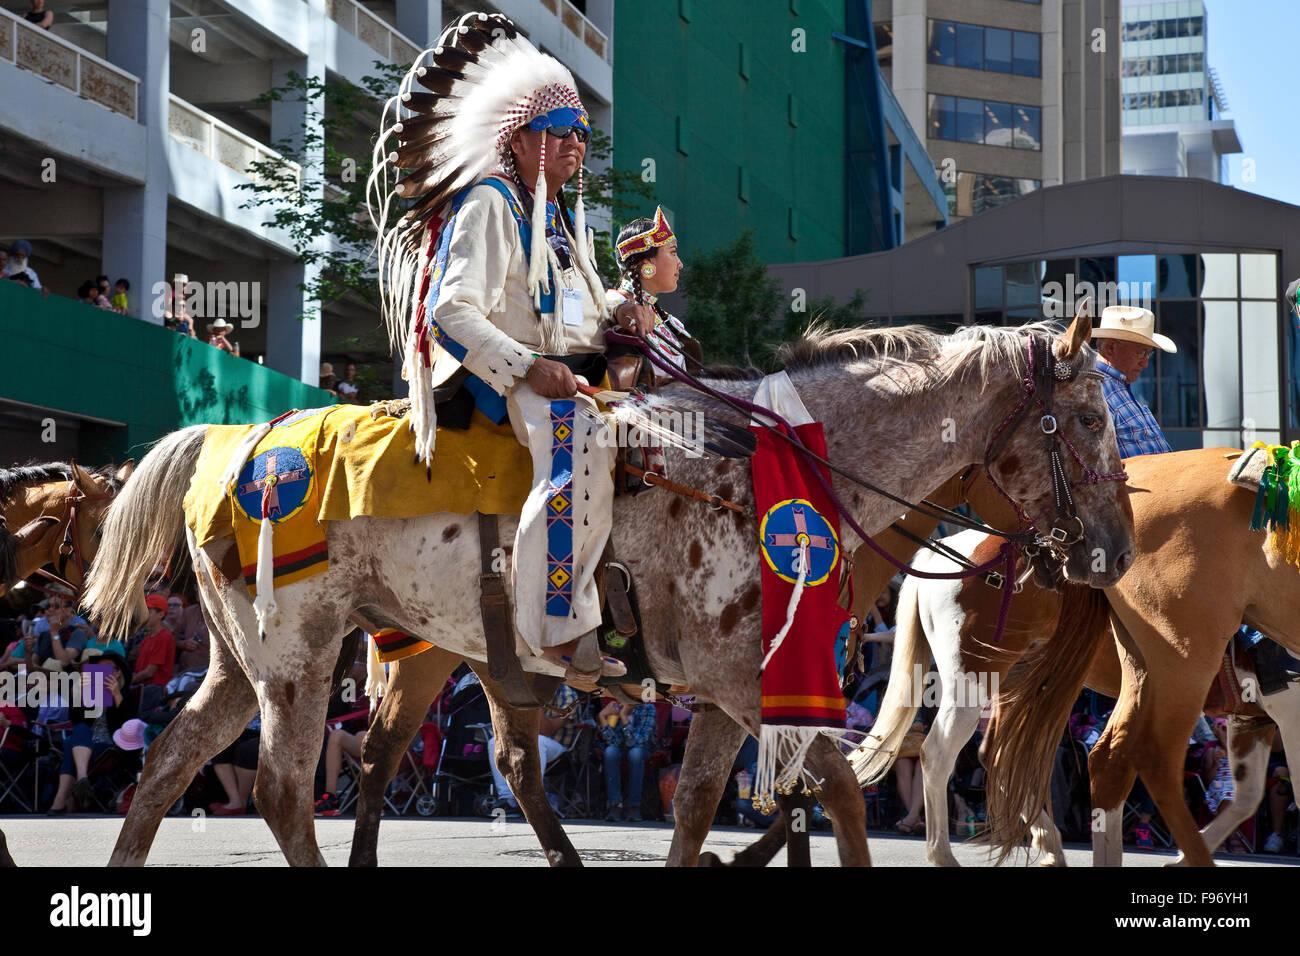 2015 Calgary Stampede Parade, Calgary, Alberta, Canada. Immagini Stock